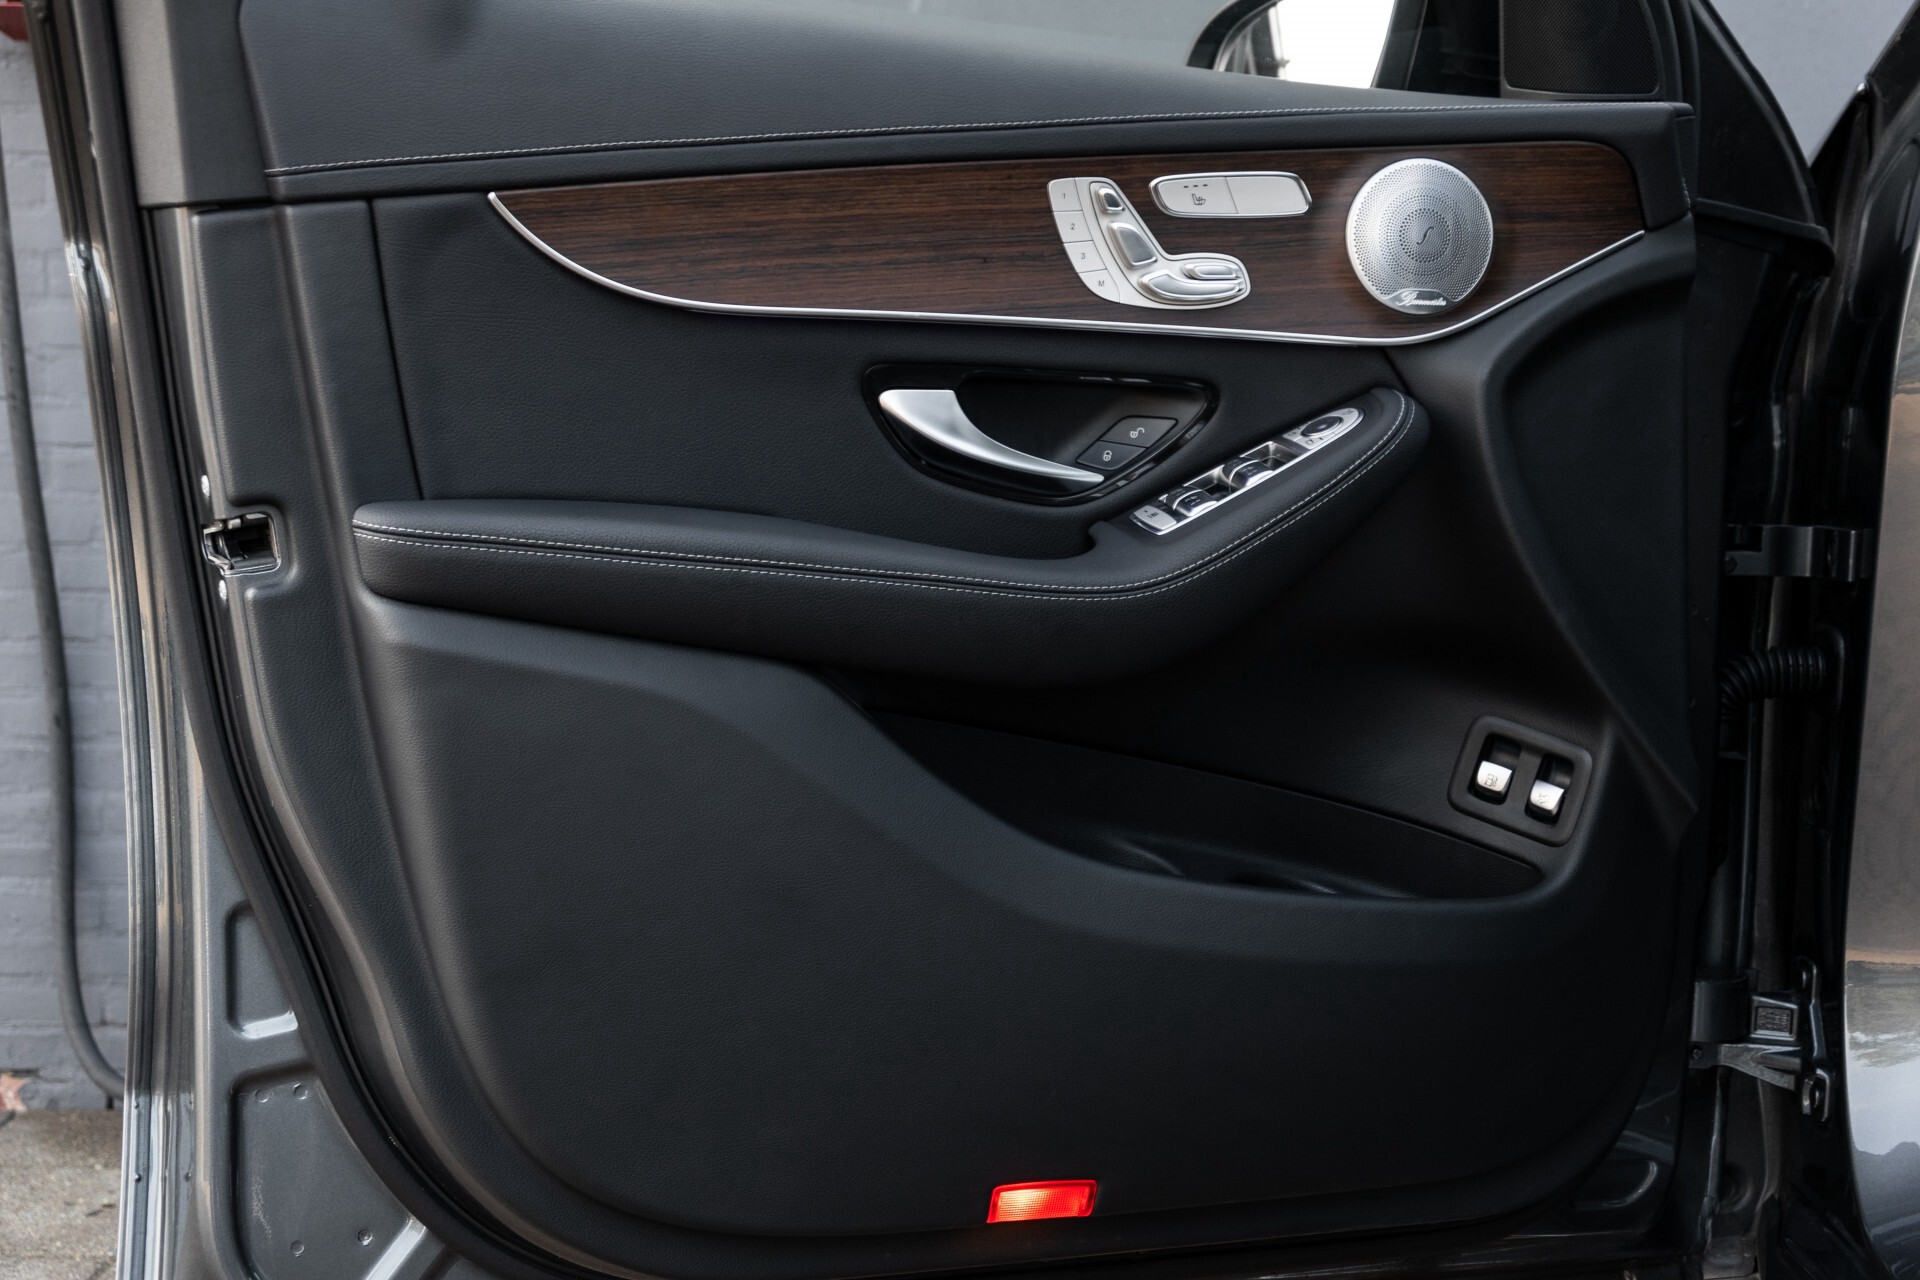 Mercedes-Benz GLC 300e 4-M Luchtvering/Panorama/Multicontourstoelen/Rij-assistentie/Standkachel Aut9 Foto 21